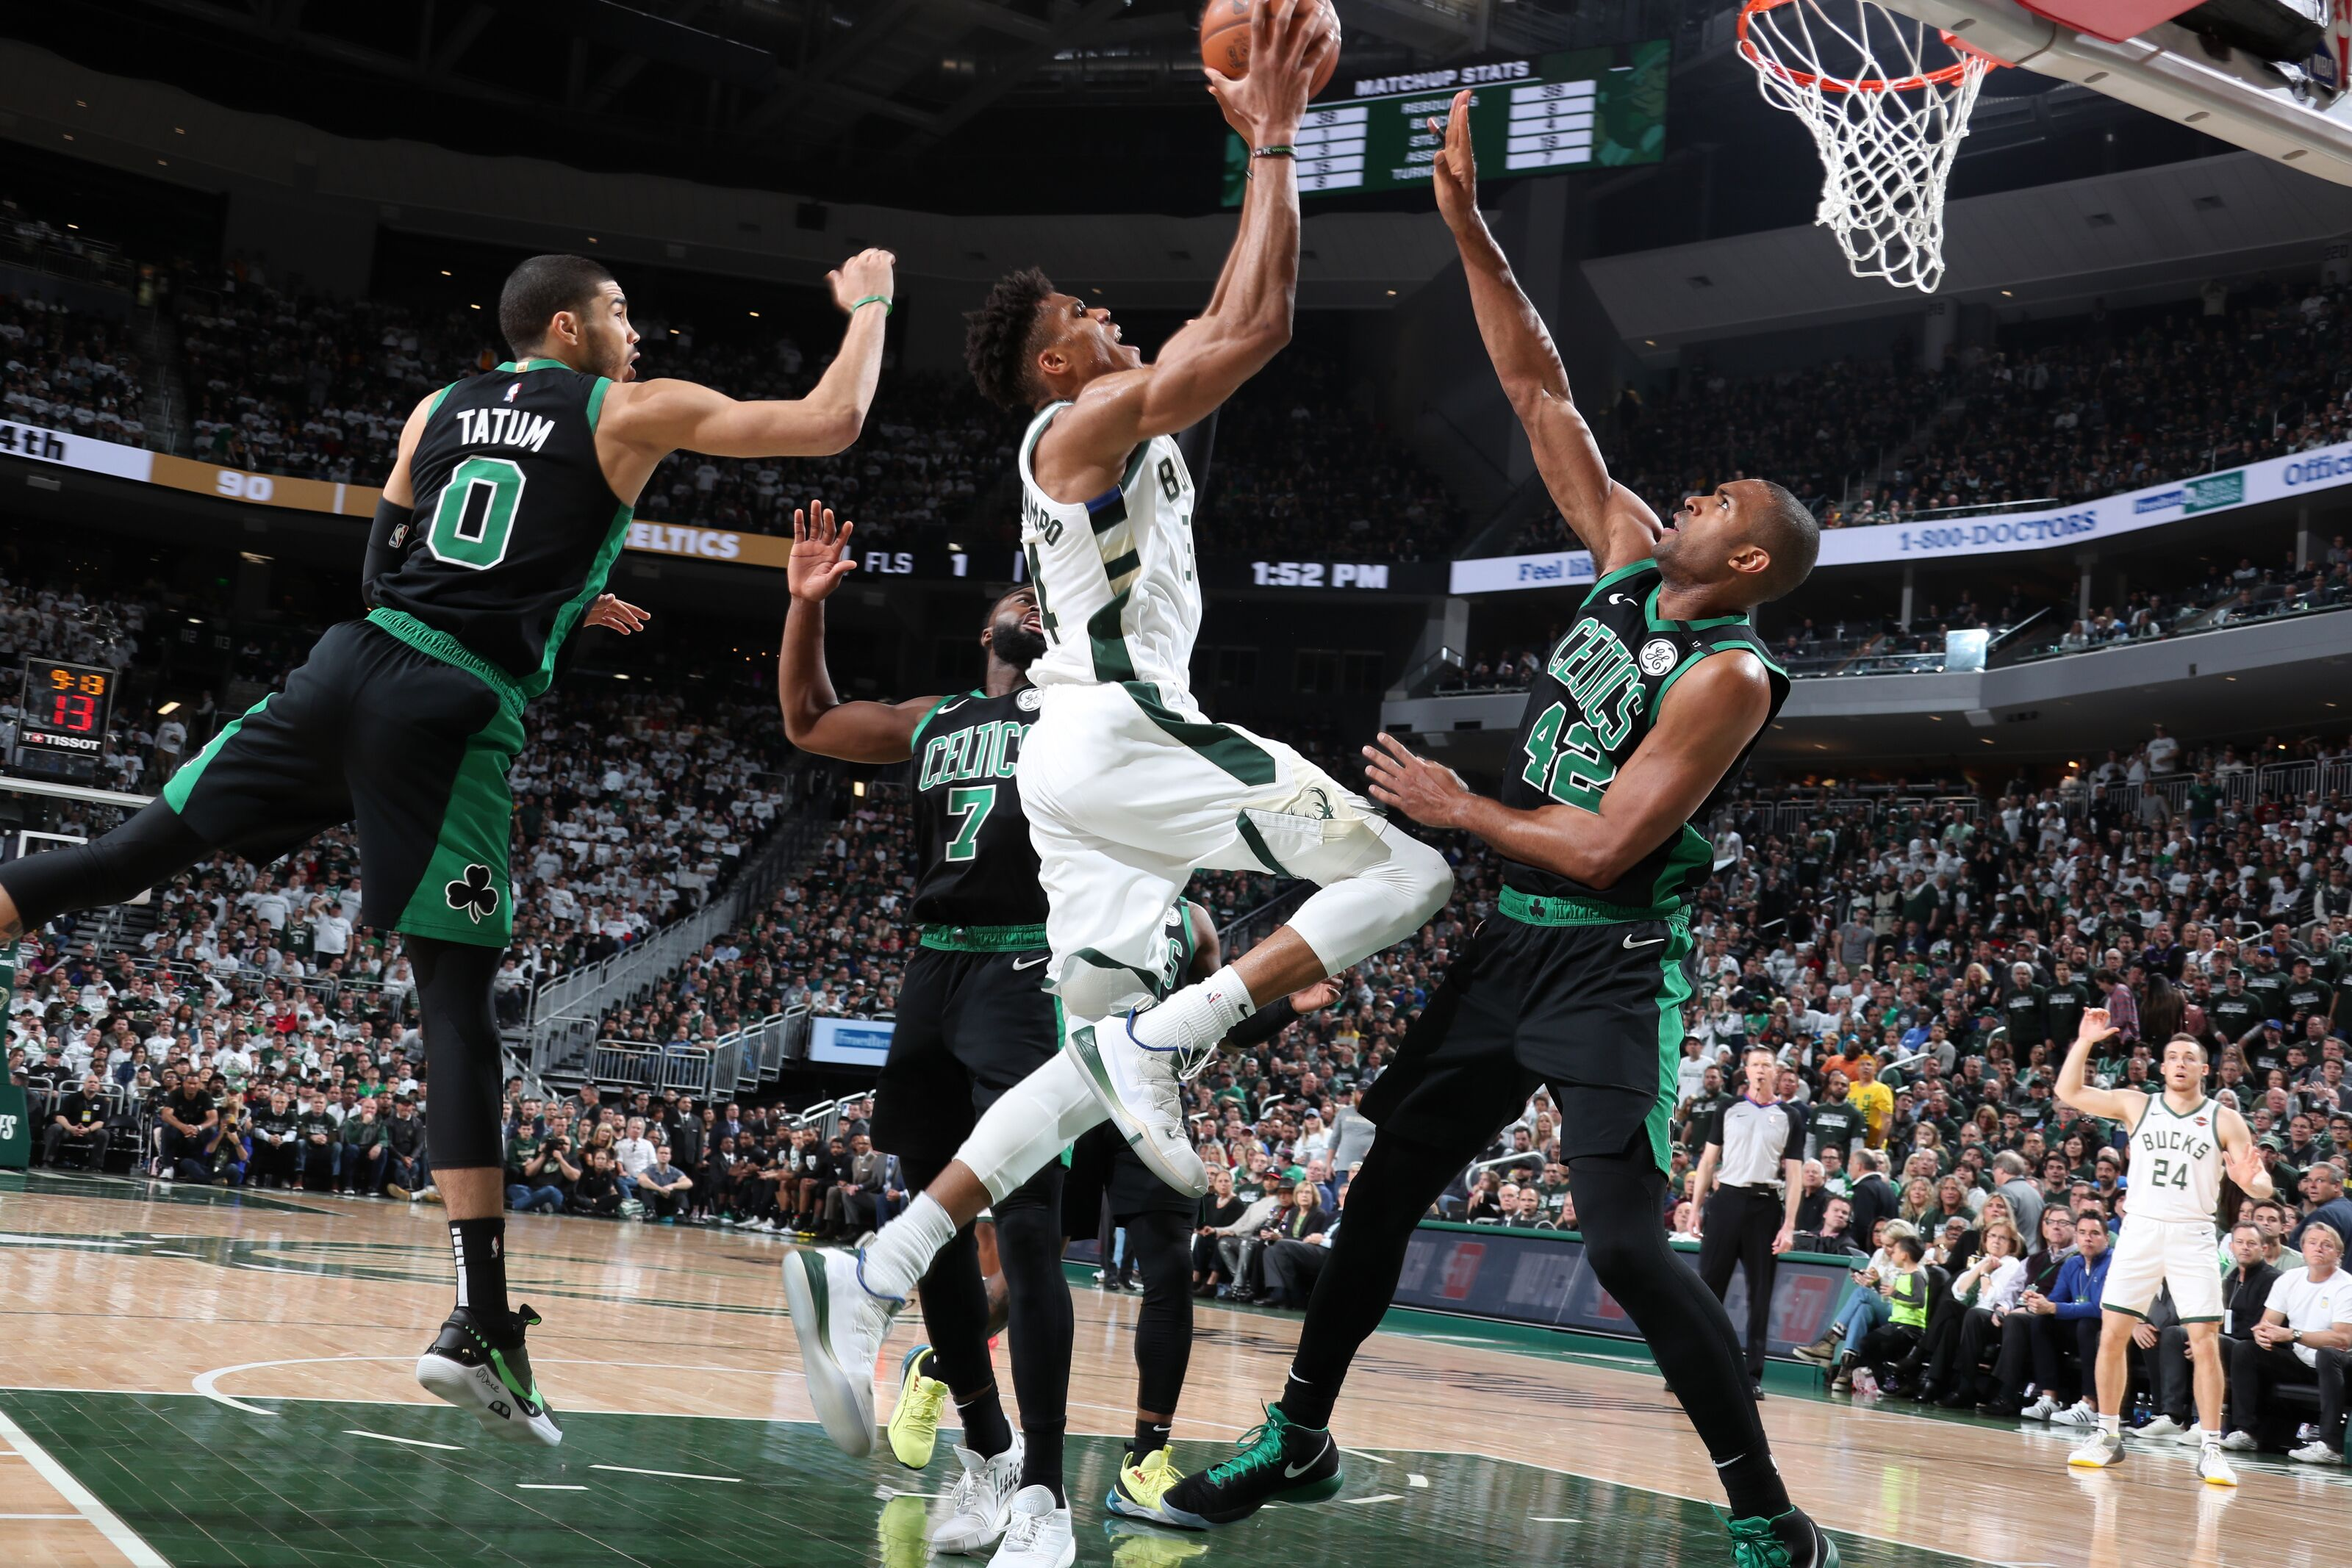 Nylon Calculus: Defending the NBA drive-and-kick